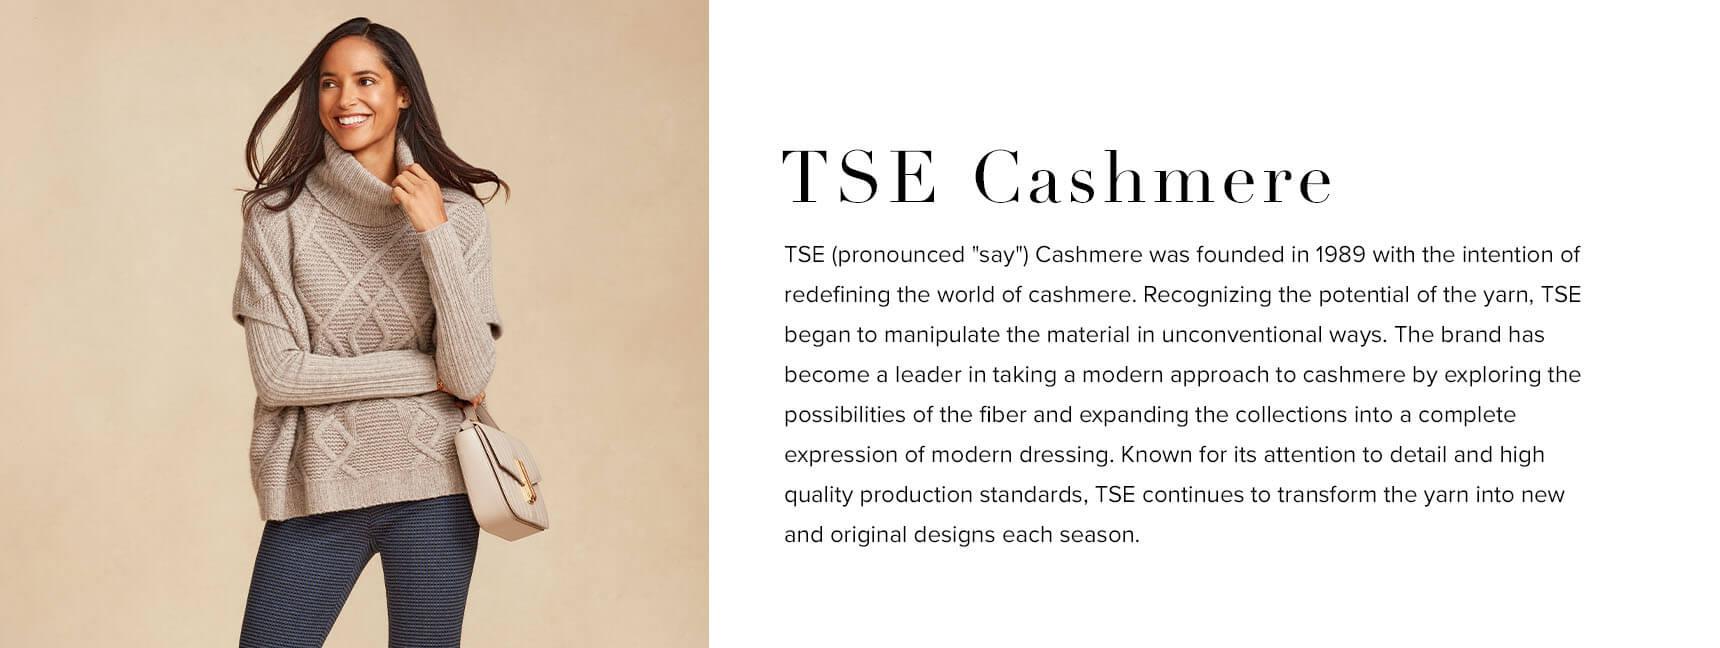 TSE Cashmere